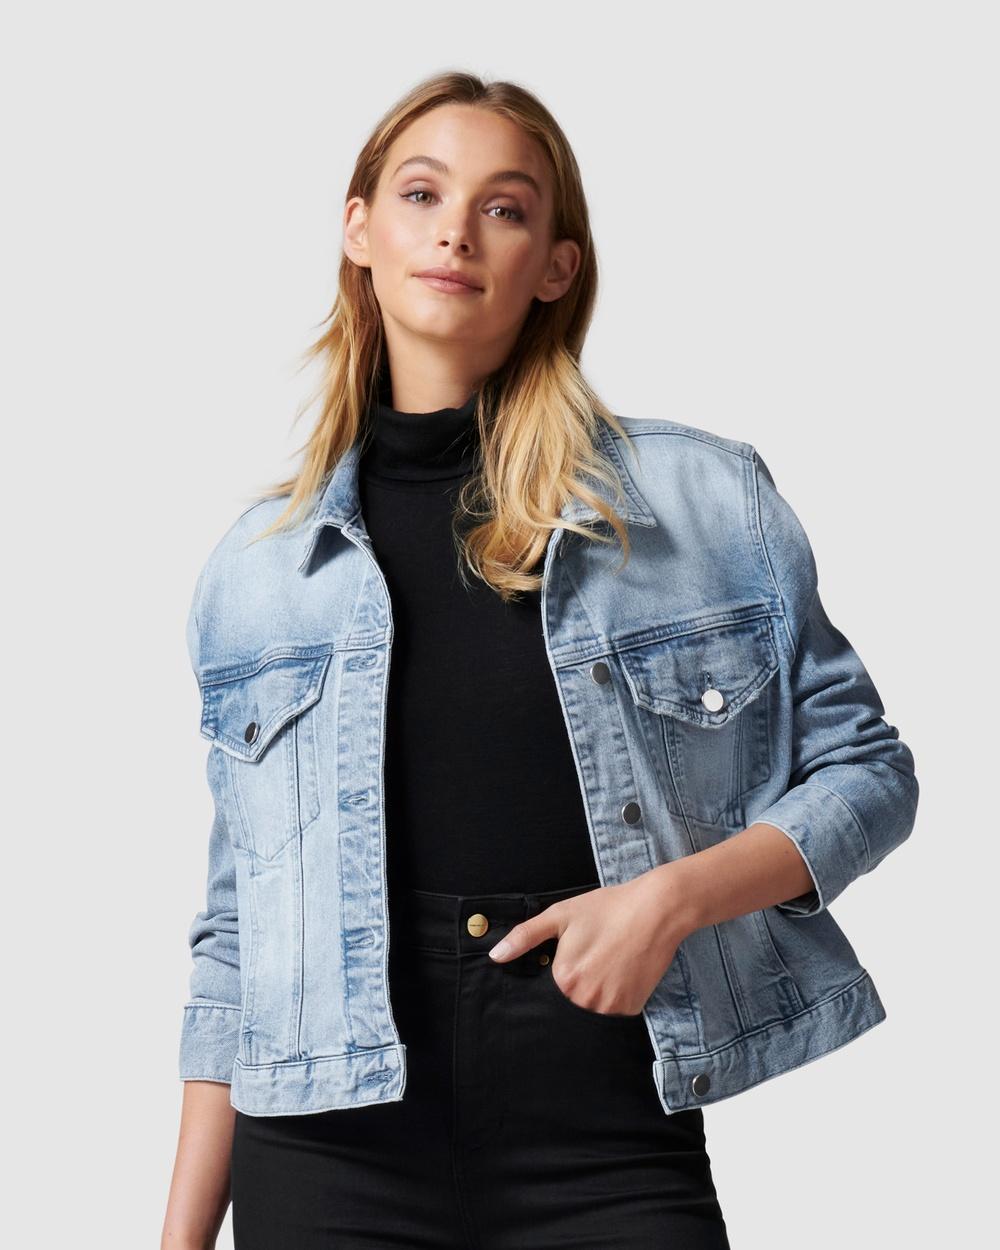 Forever New Hanna Denim Jacket jacket Light Wash Australia